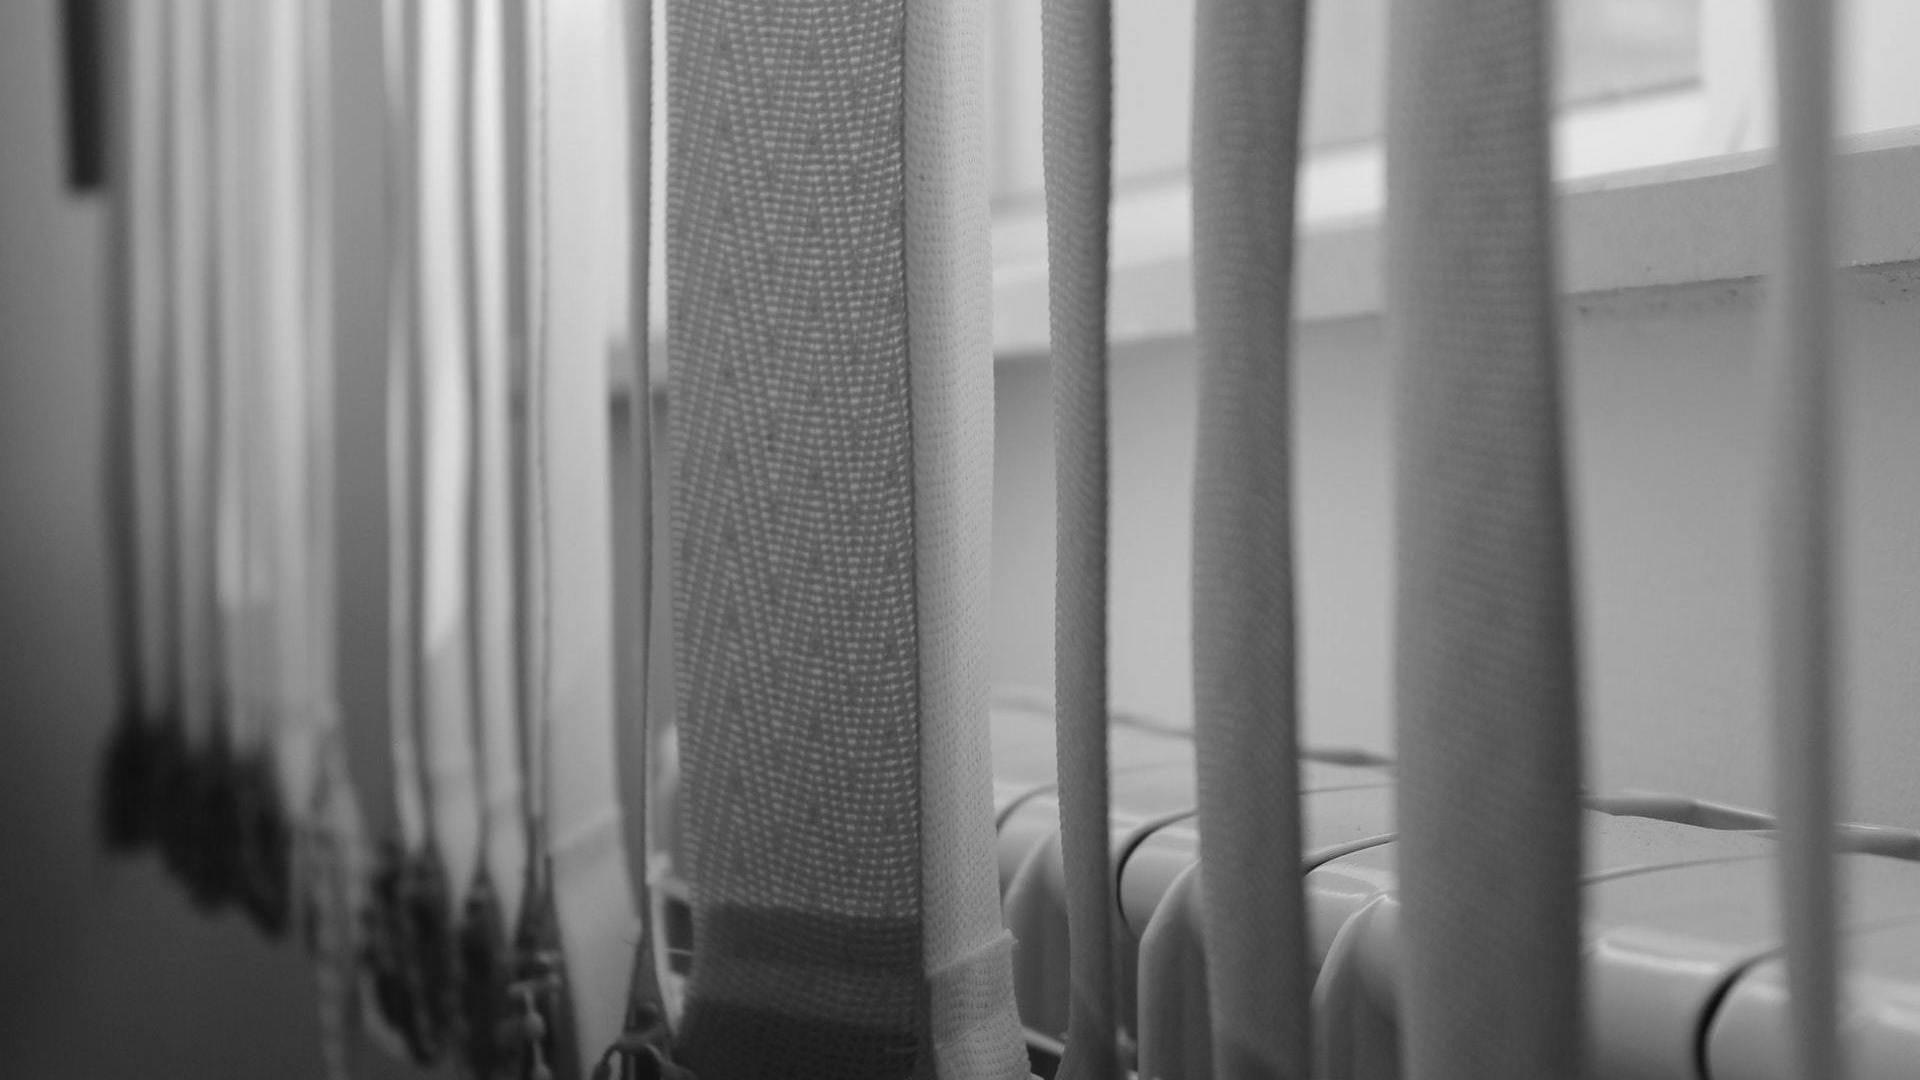 Tende Per Ufficio Orizzontali : Tende casa a trieste i migliori installatori di tende verticali